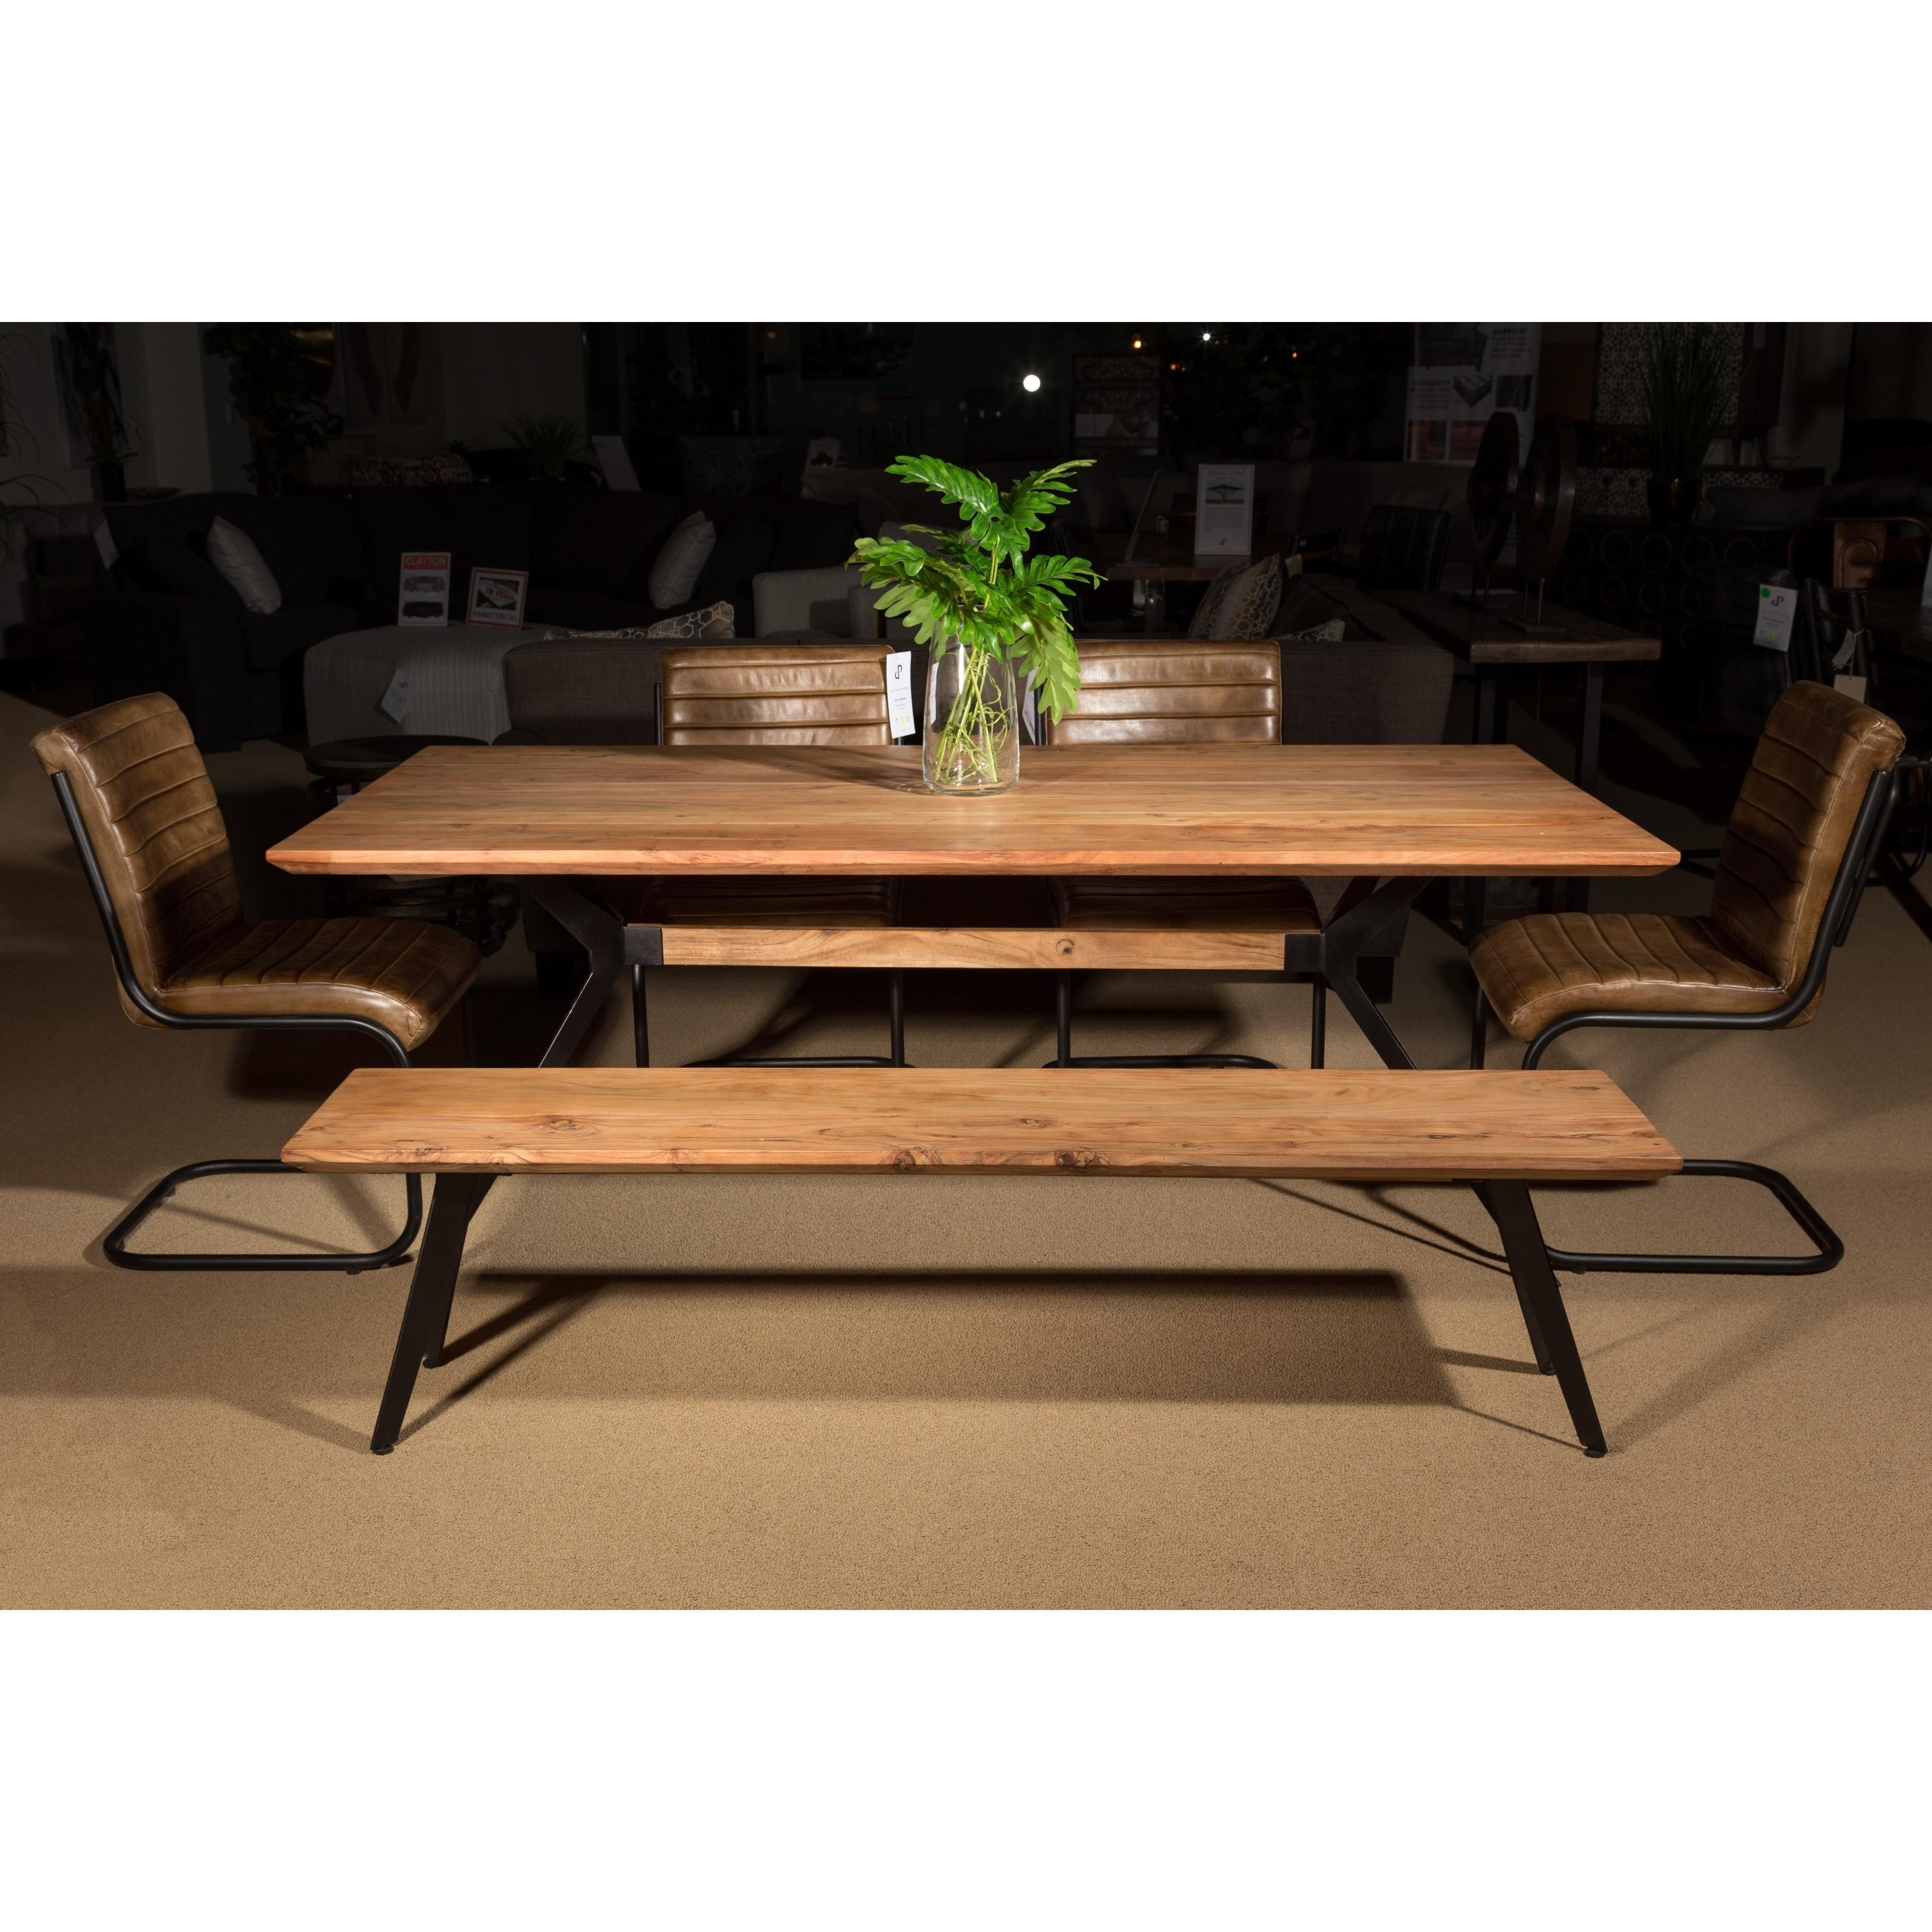 3be6985e6550a Shop Wanderloot Boomerang Mid-century Modern Acacia Wood Handmade Dining  Bench - Free Shipping Today - Overstock - 22530185